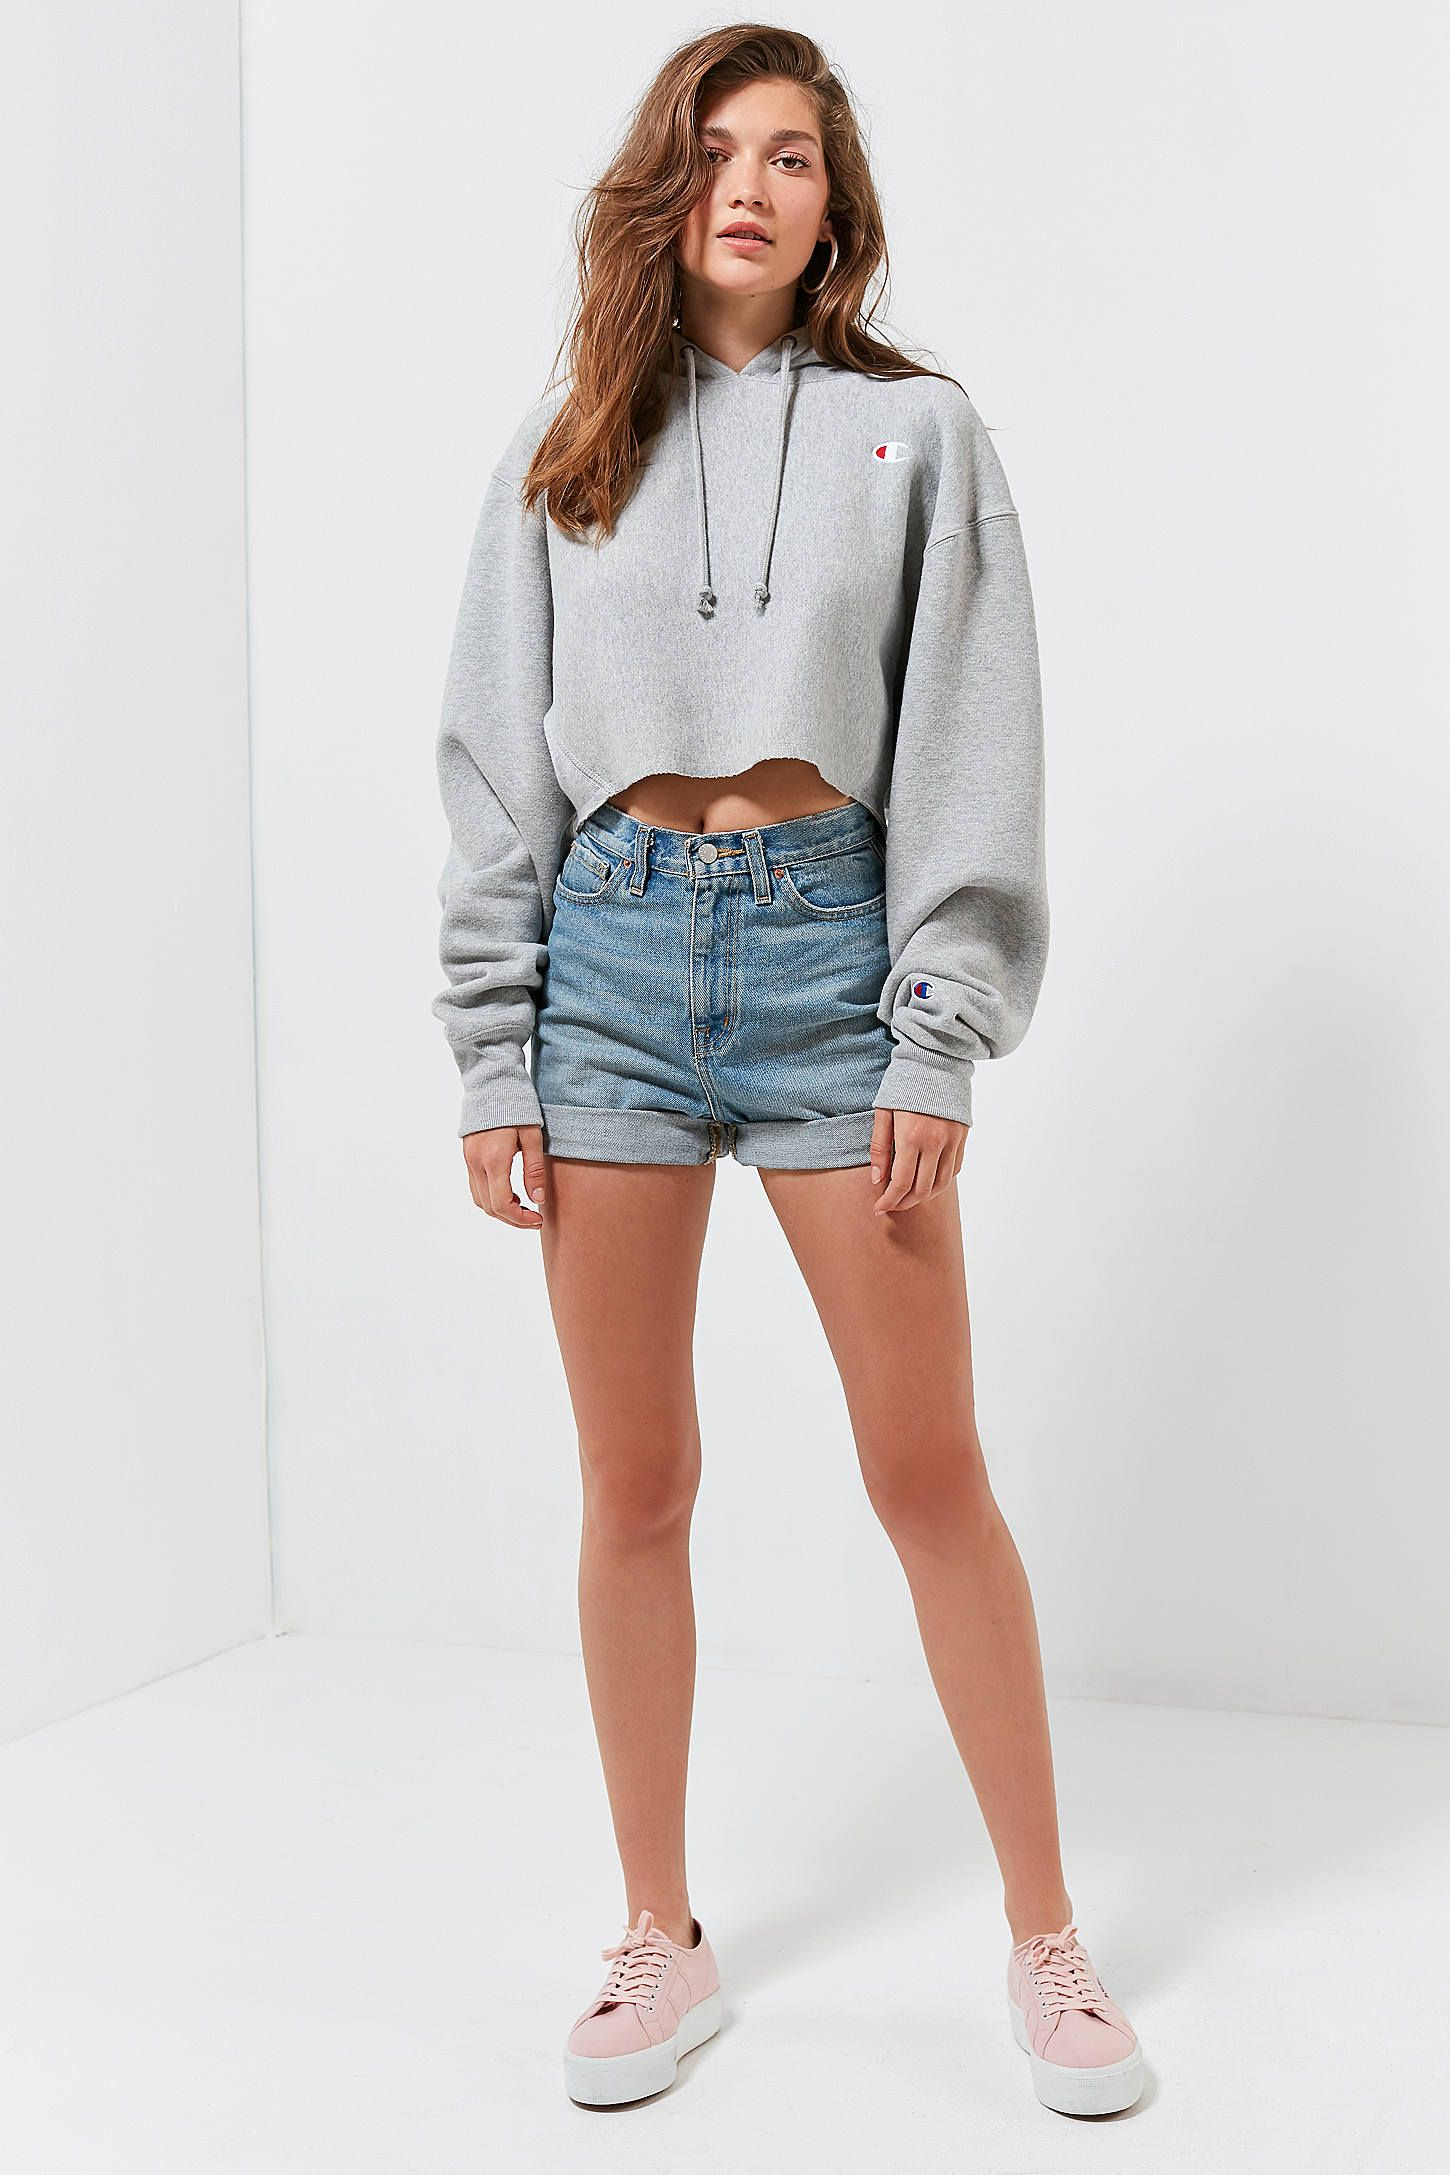 Champion Uo Cropped Hoodie Sweatshirt Urban Outfitters Canada Urban Wear Crop Sweatshirt Hoodie Fashion [ 2175 x 1450 Pixel ]